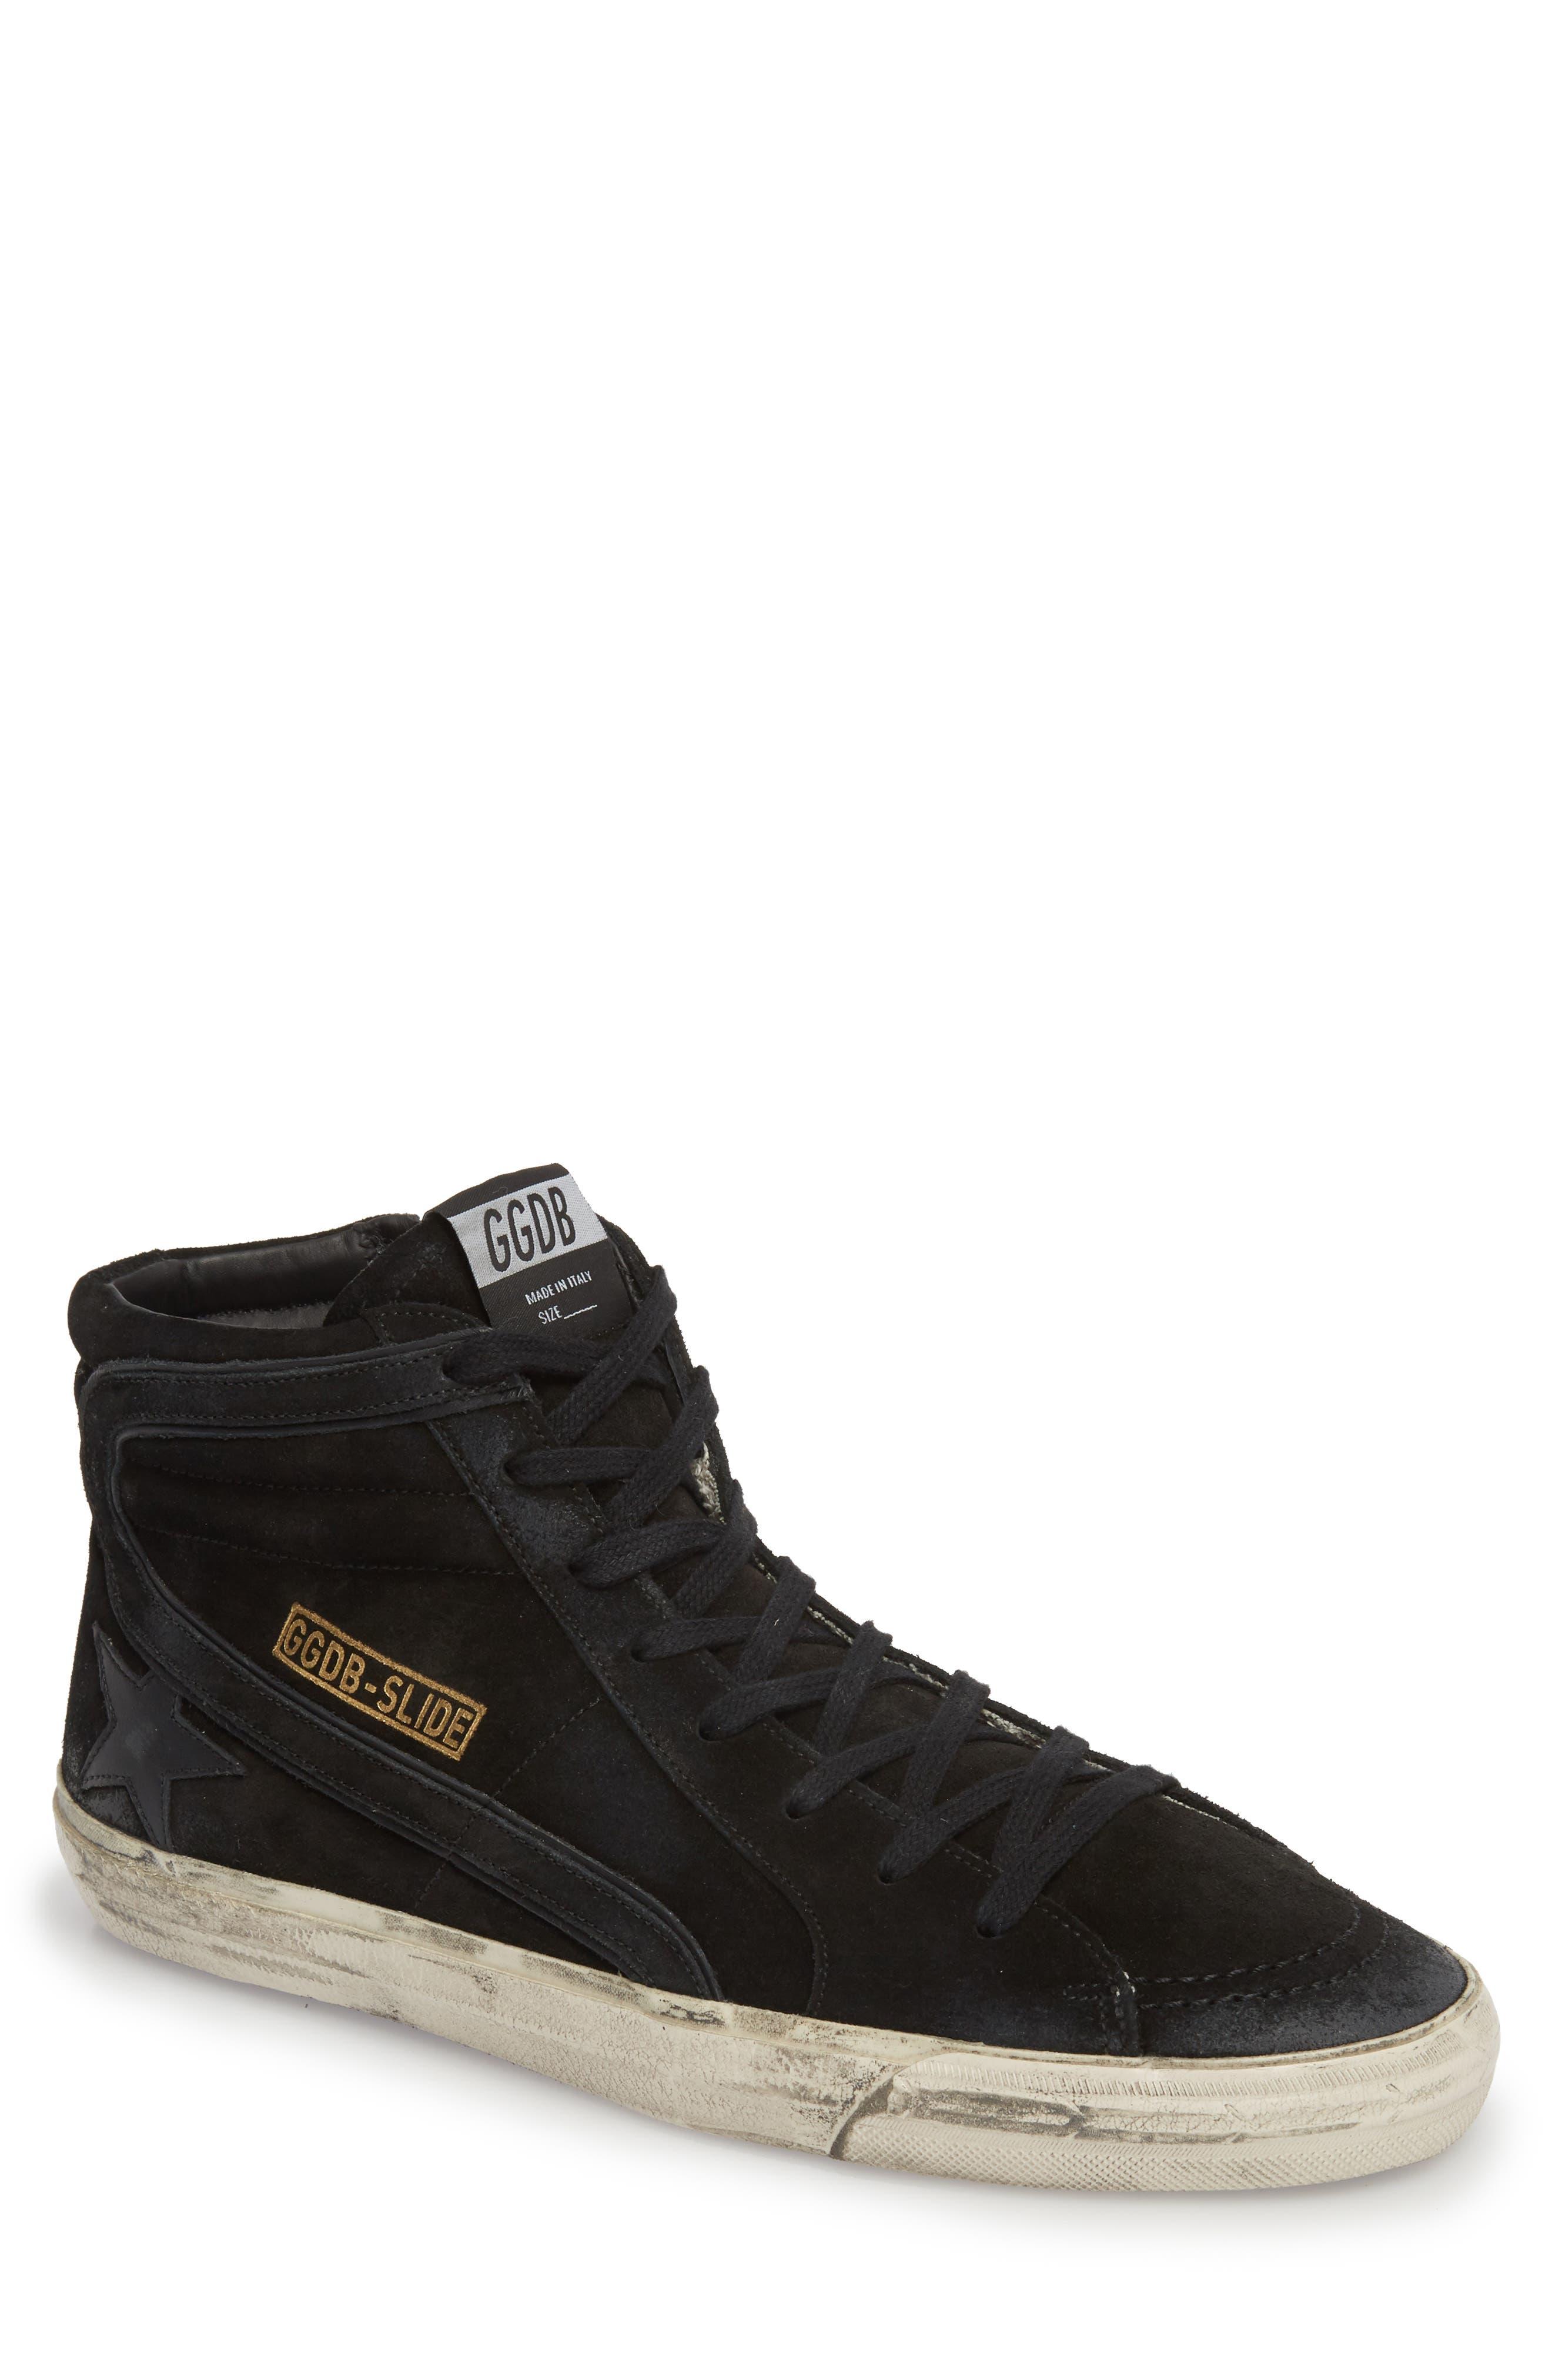 'Slide' Sneaker,                             Main thumbnail 1, color,                             BLACK SUEDE